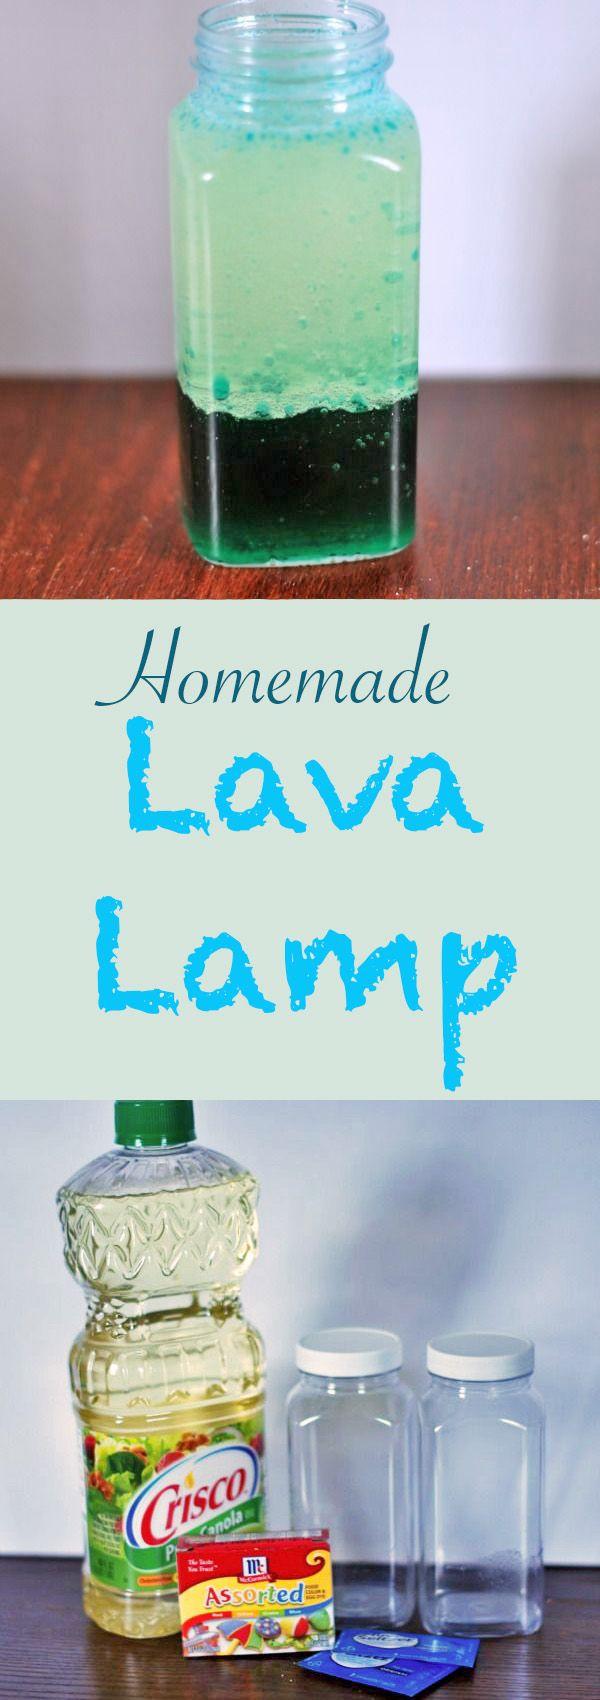 DIY Homemade Lava Lamp Homemade lava lamp, Rainy day